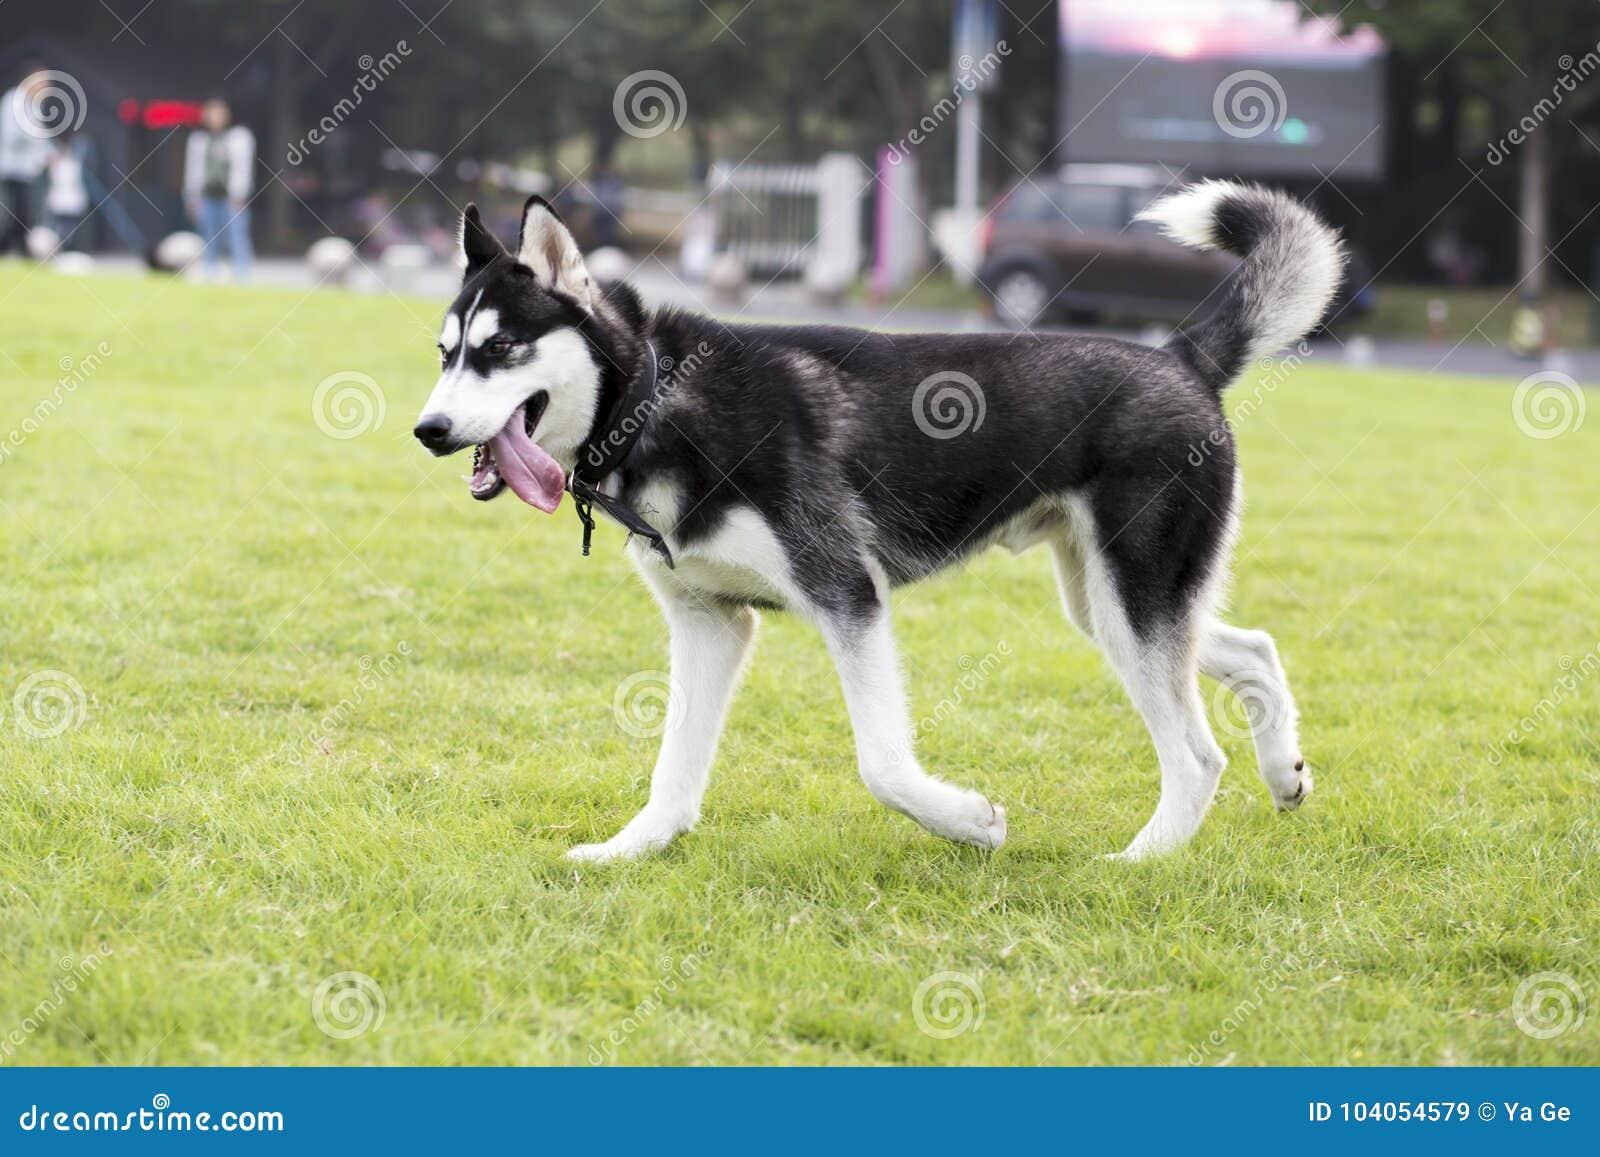 How to name the husky